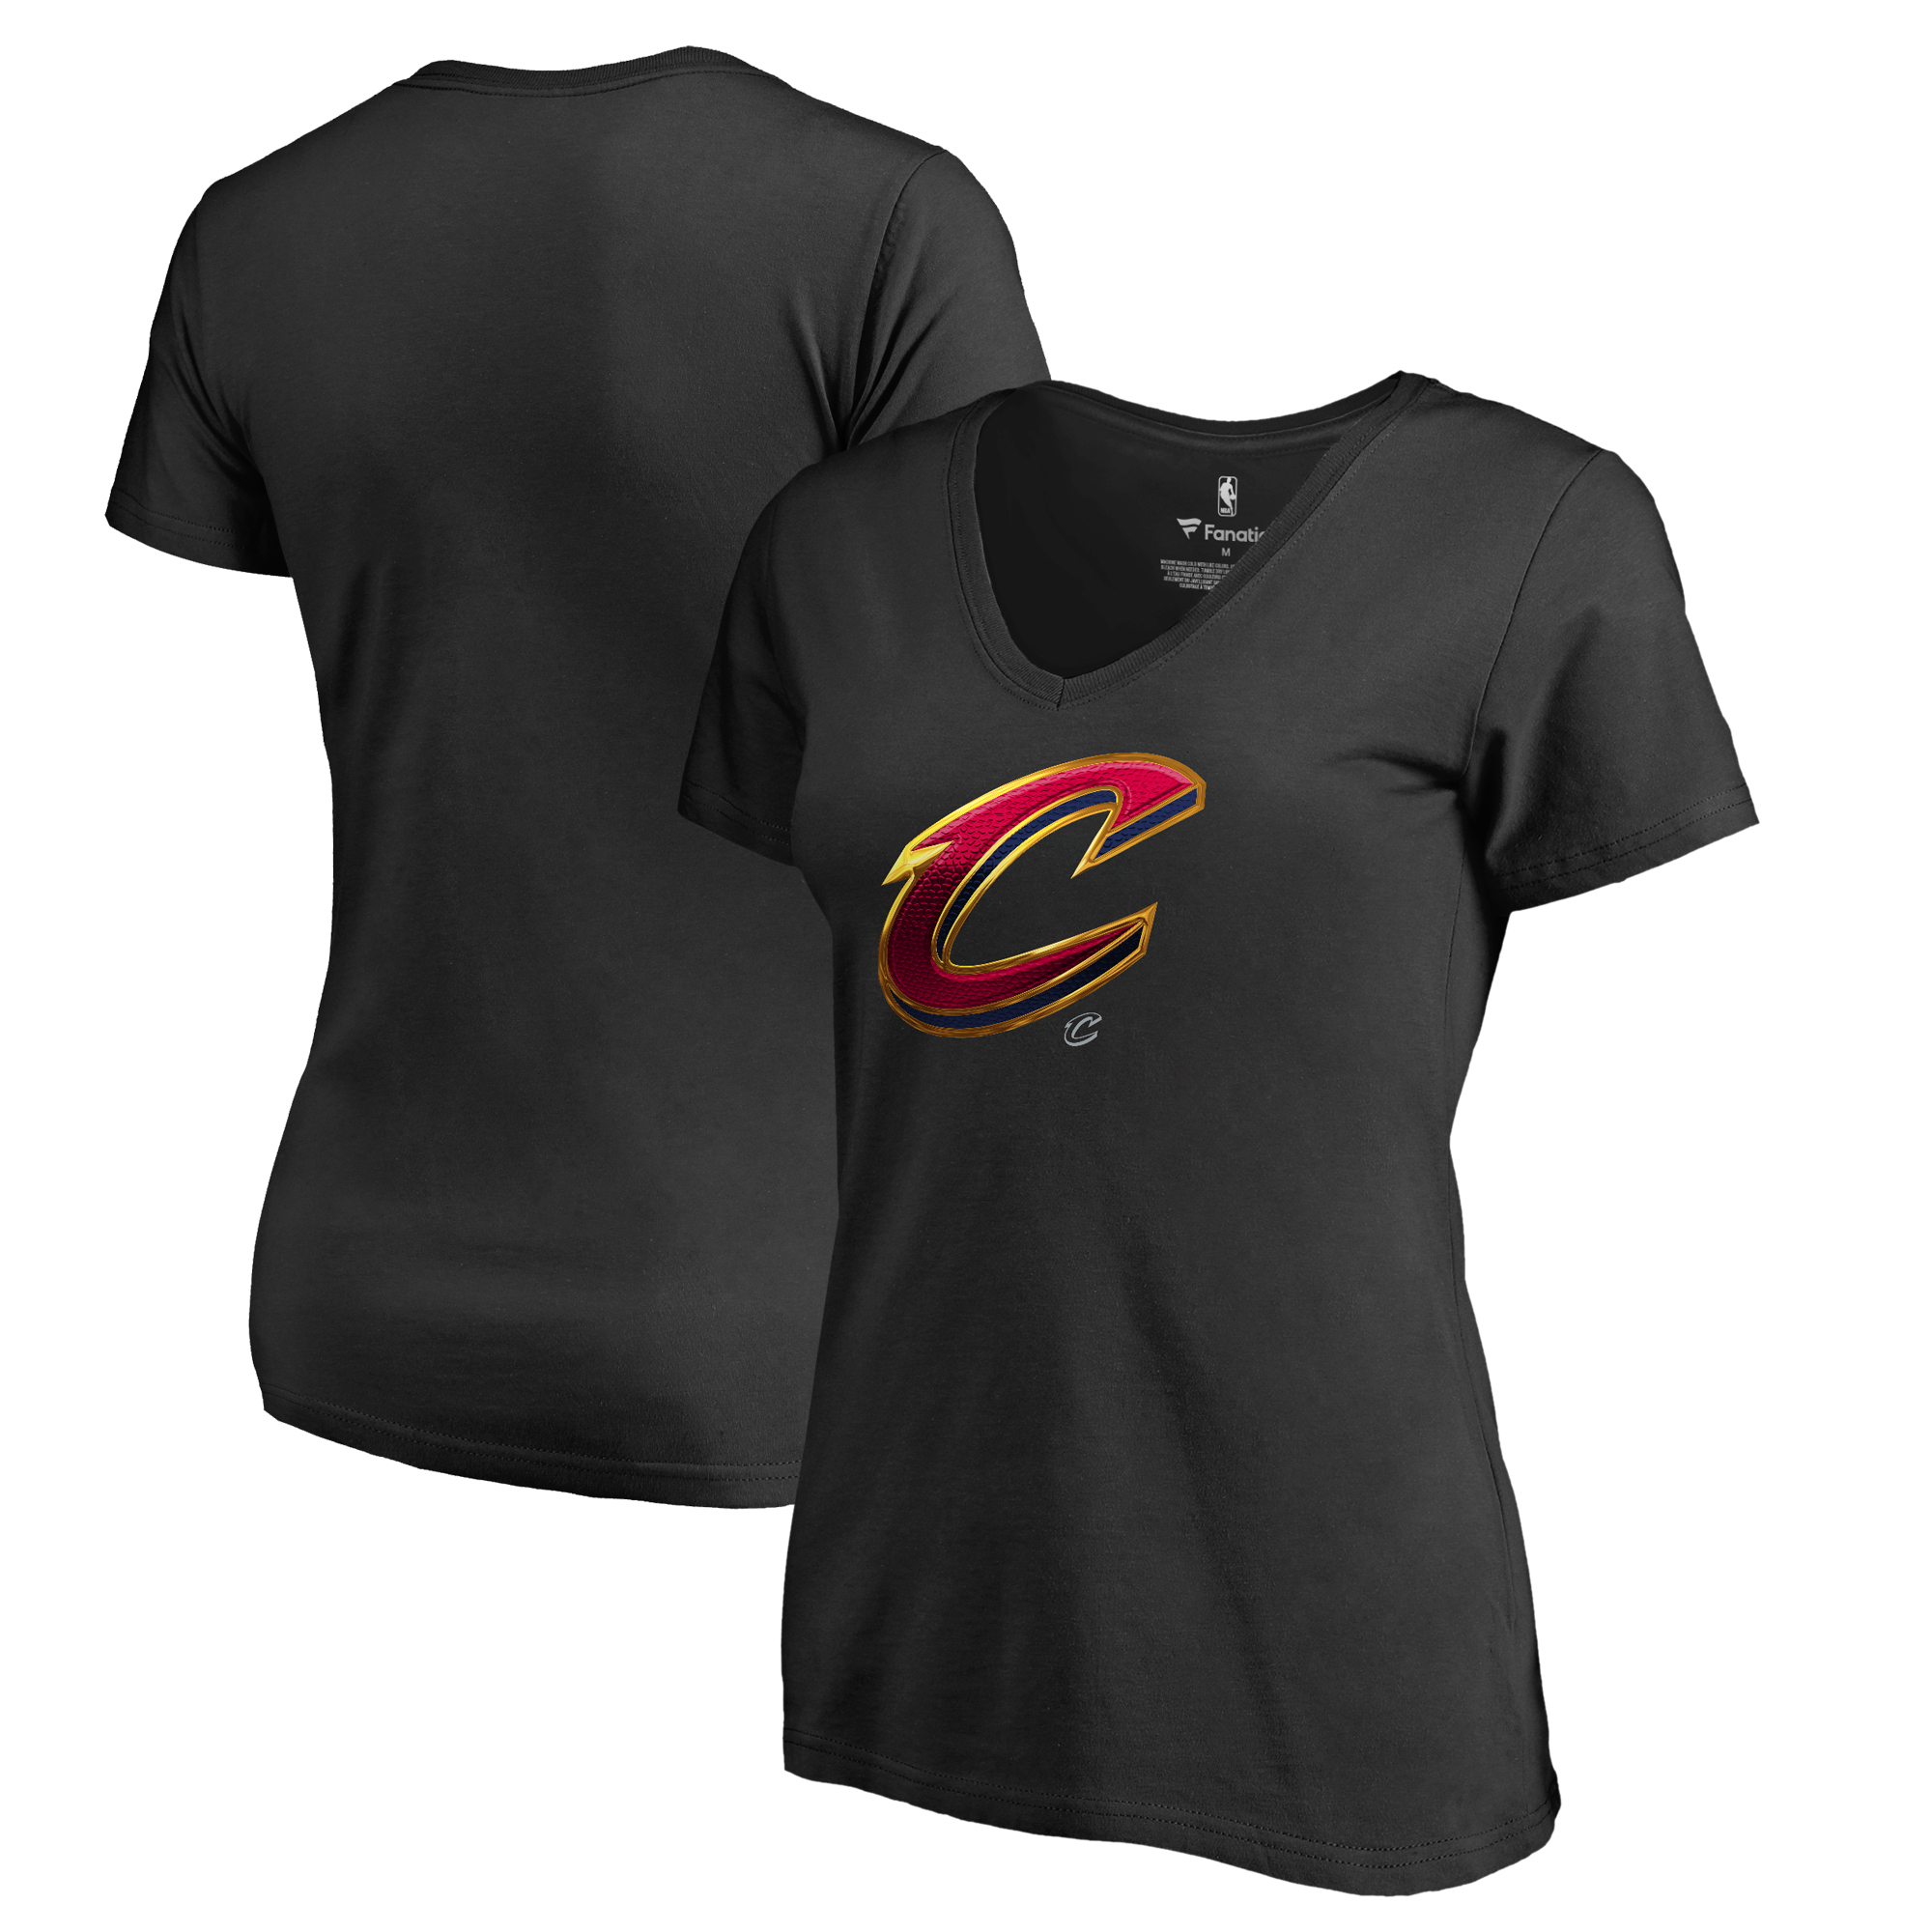 Cleveland Cavaliers Fanatics Branded Women's Midnight Mascot V-Neck T-Shirt - Black